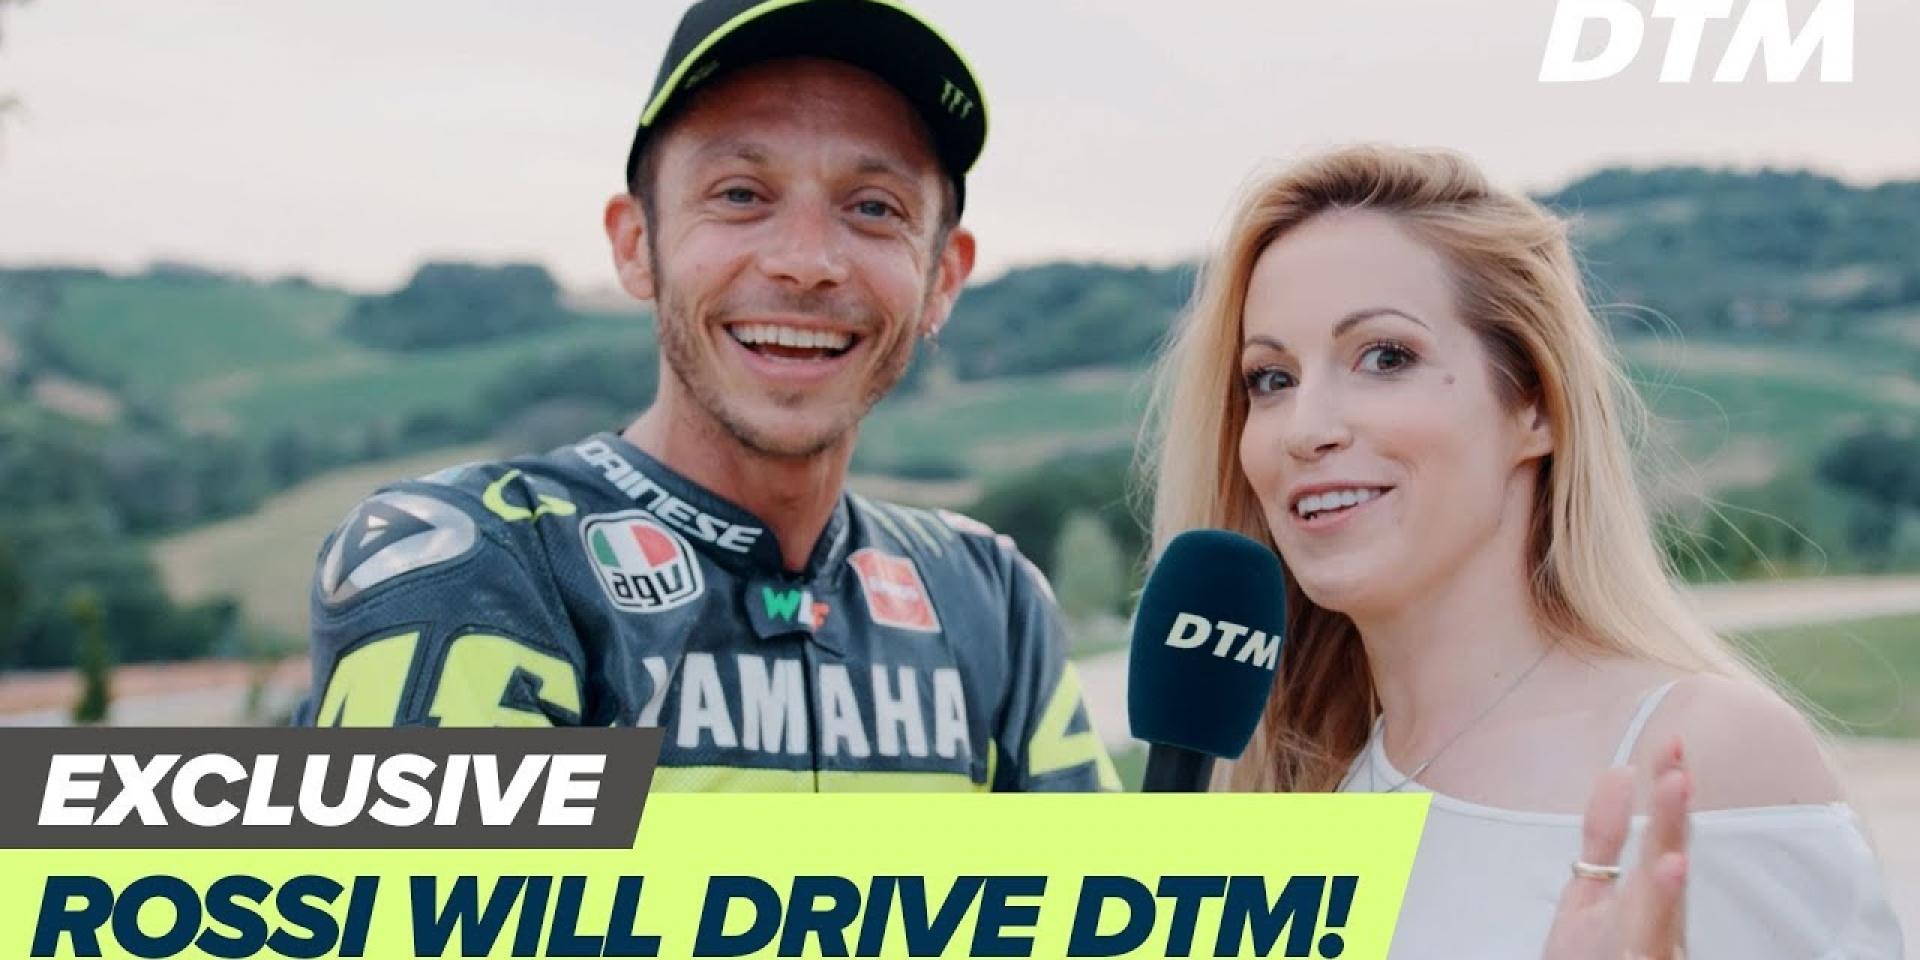 Rossi退休後不離開賽道!可能轉往四輪DTM賽事發展?